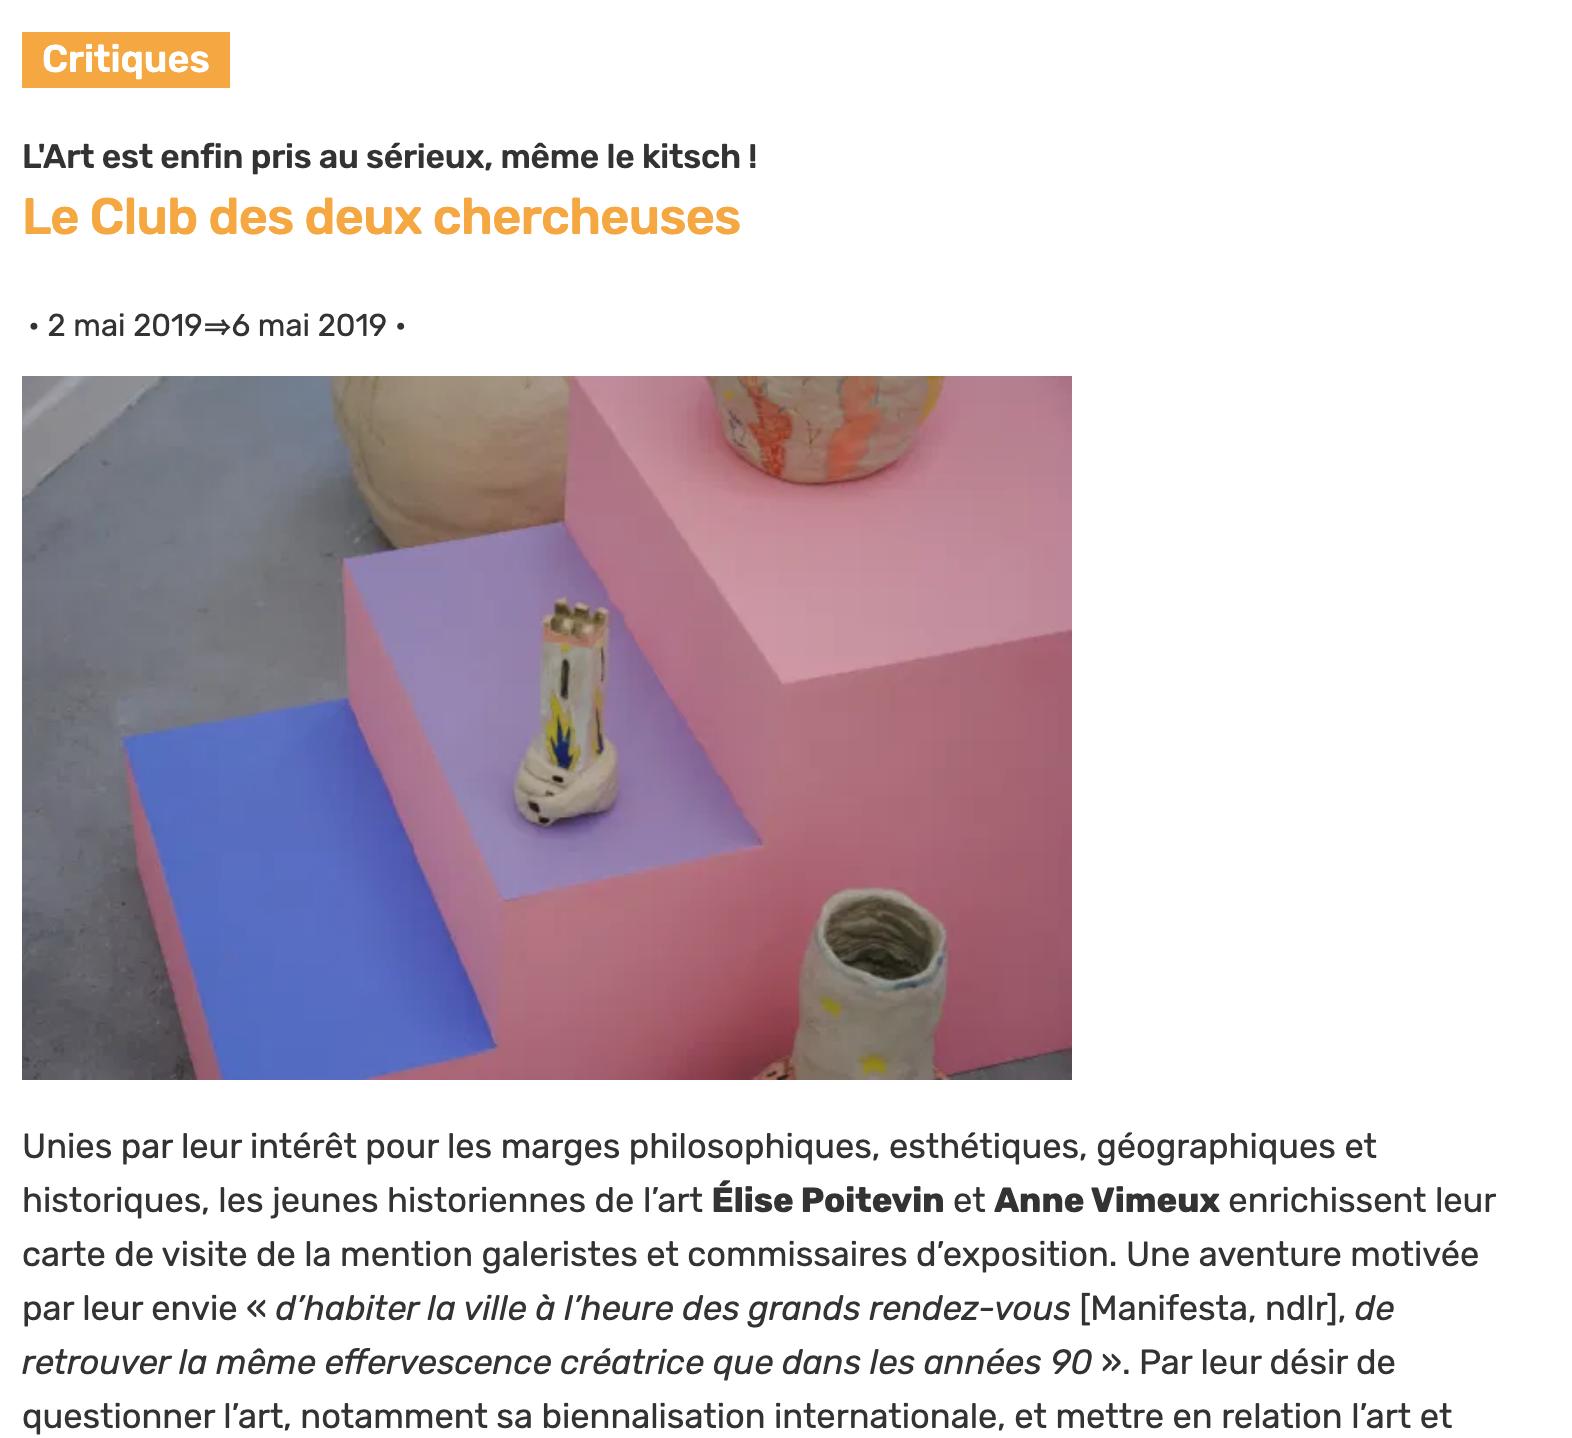 Zibeline - Marie Godfrin Giudicelli - Club des deux chercheuses  - Sissi Club - Elise Poitevin & Anne Vimeux